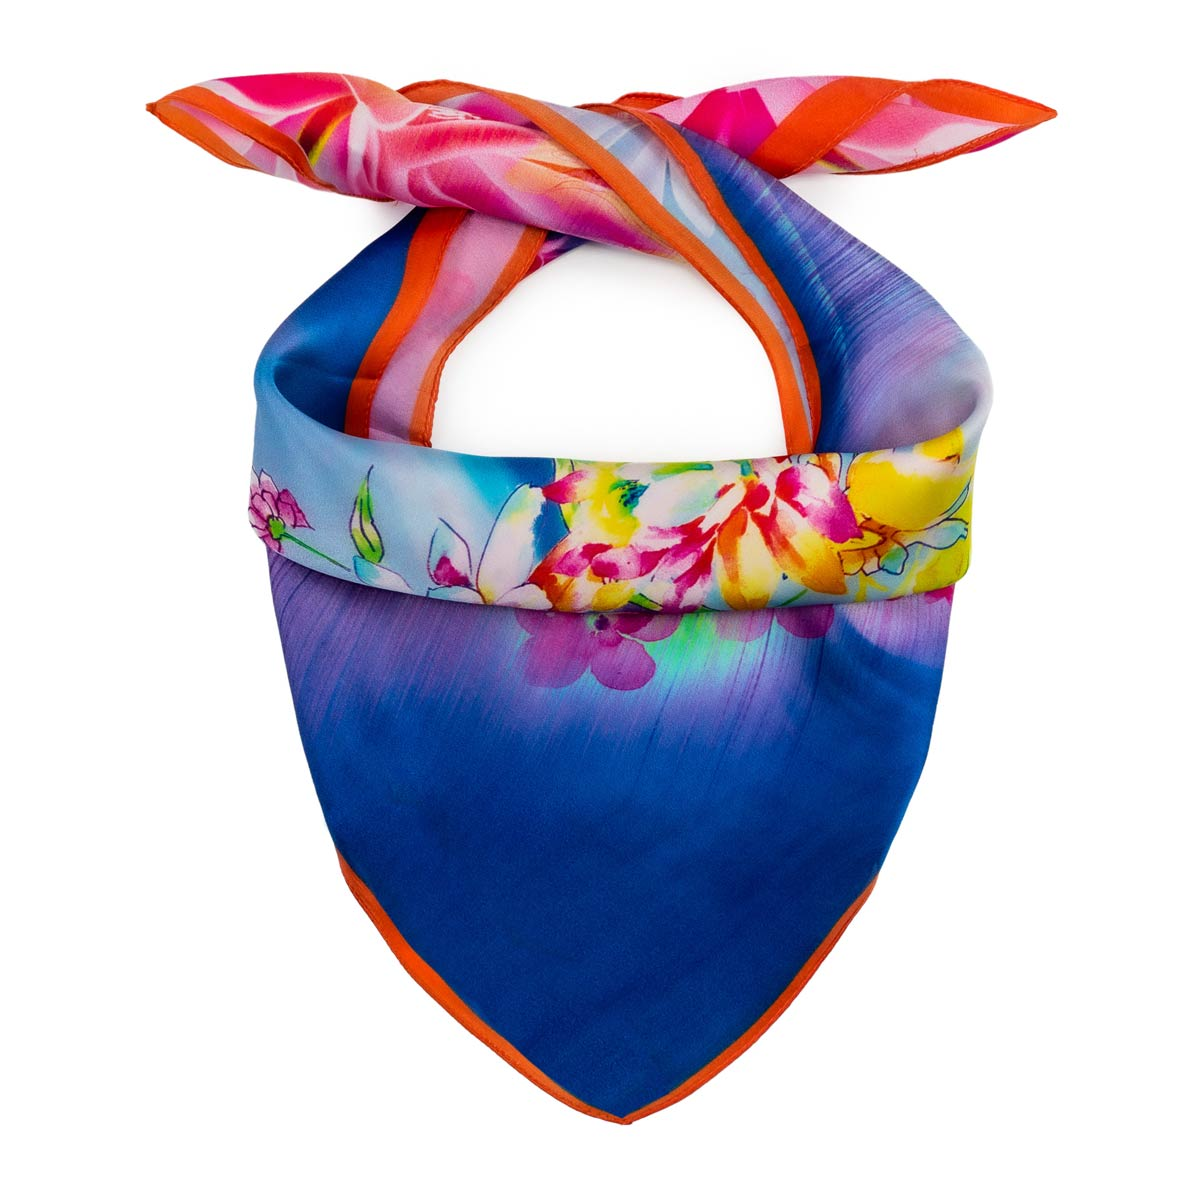 AT-06366_F12-1-foulard-soie-femme-floral-bleu